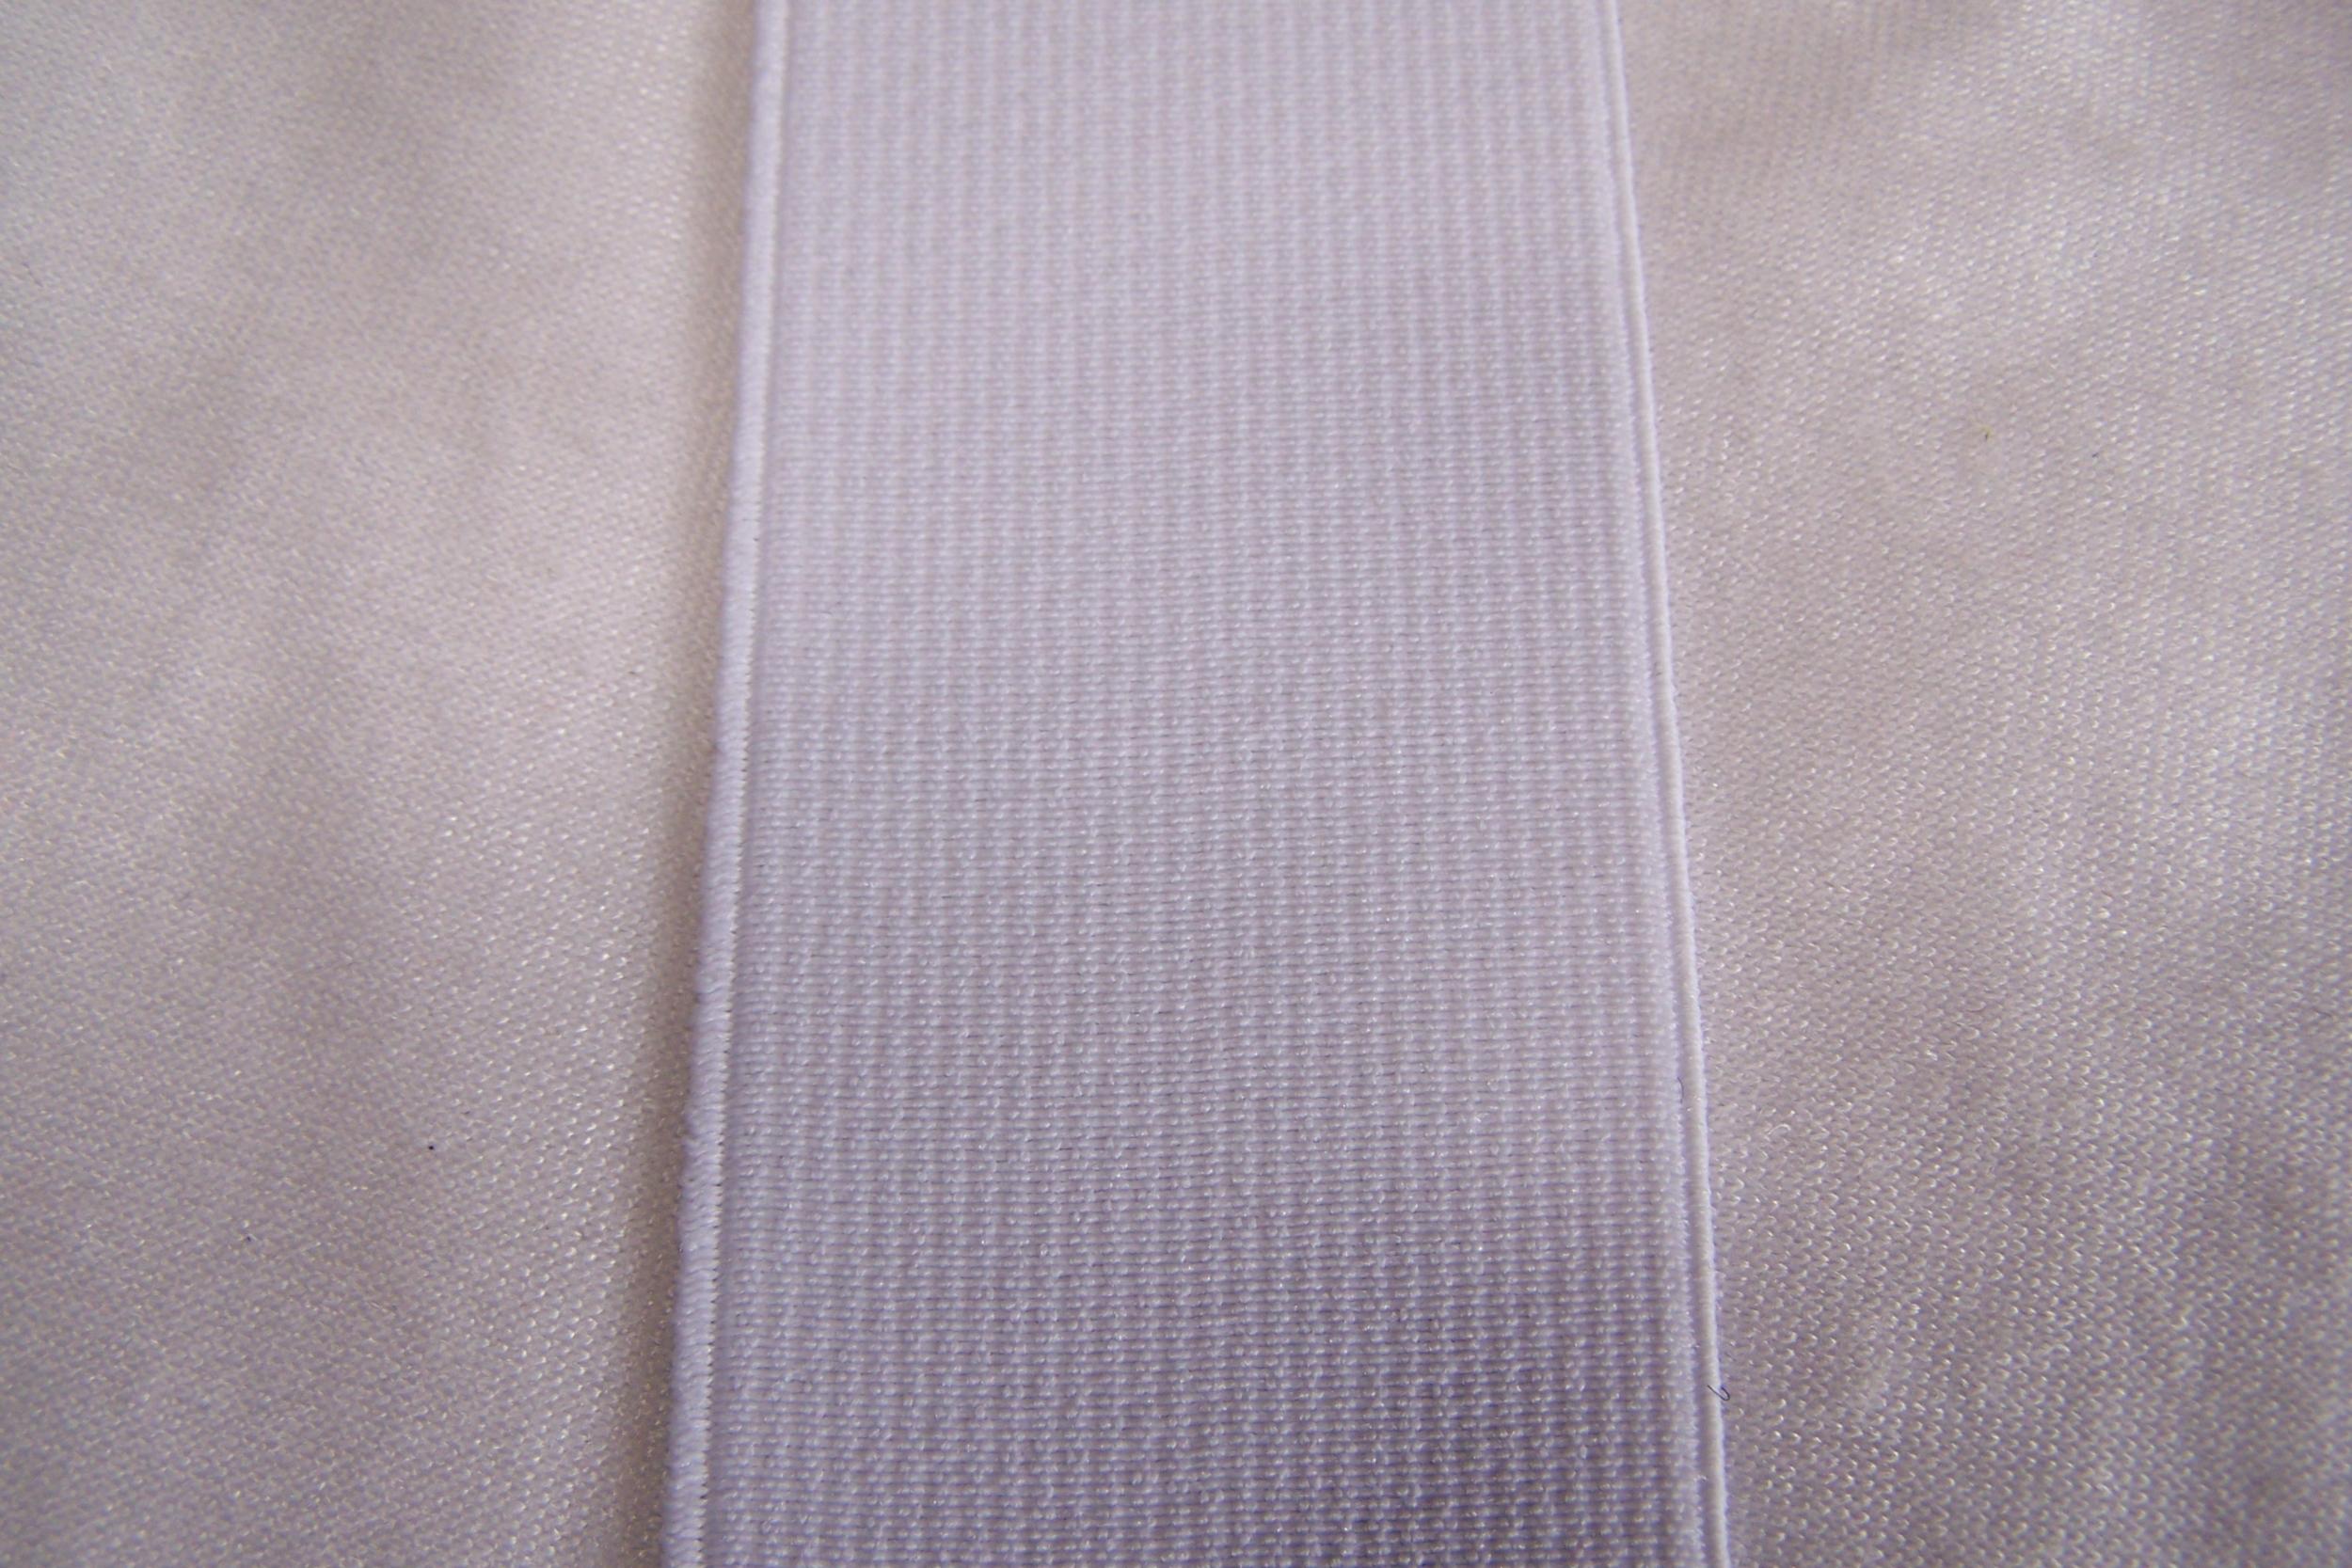 Ruban élastique, blanc